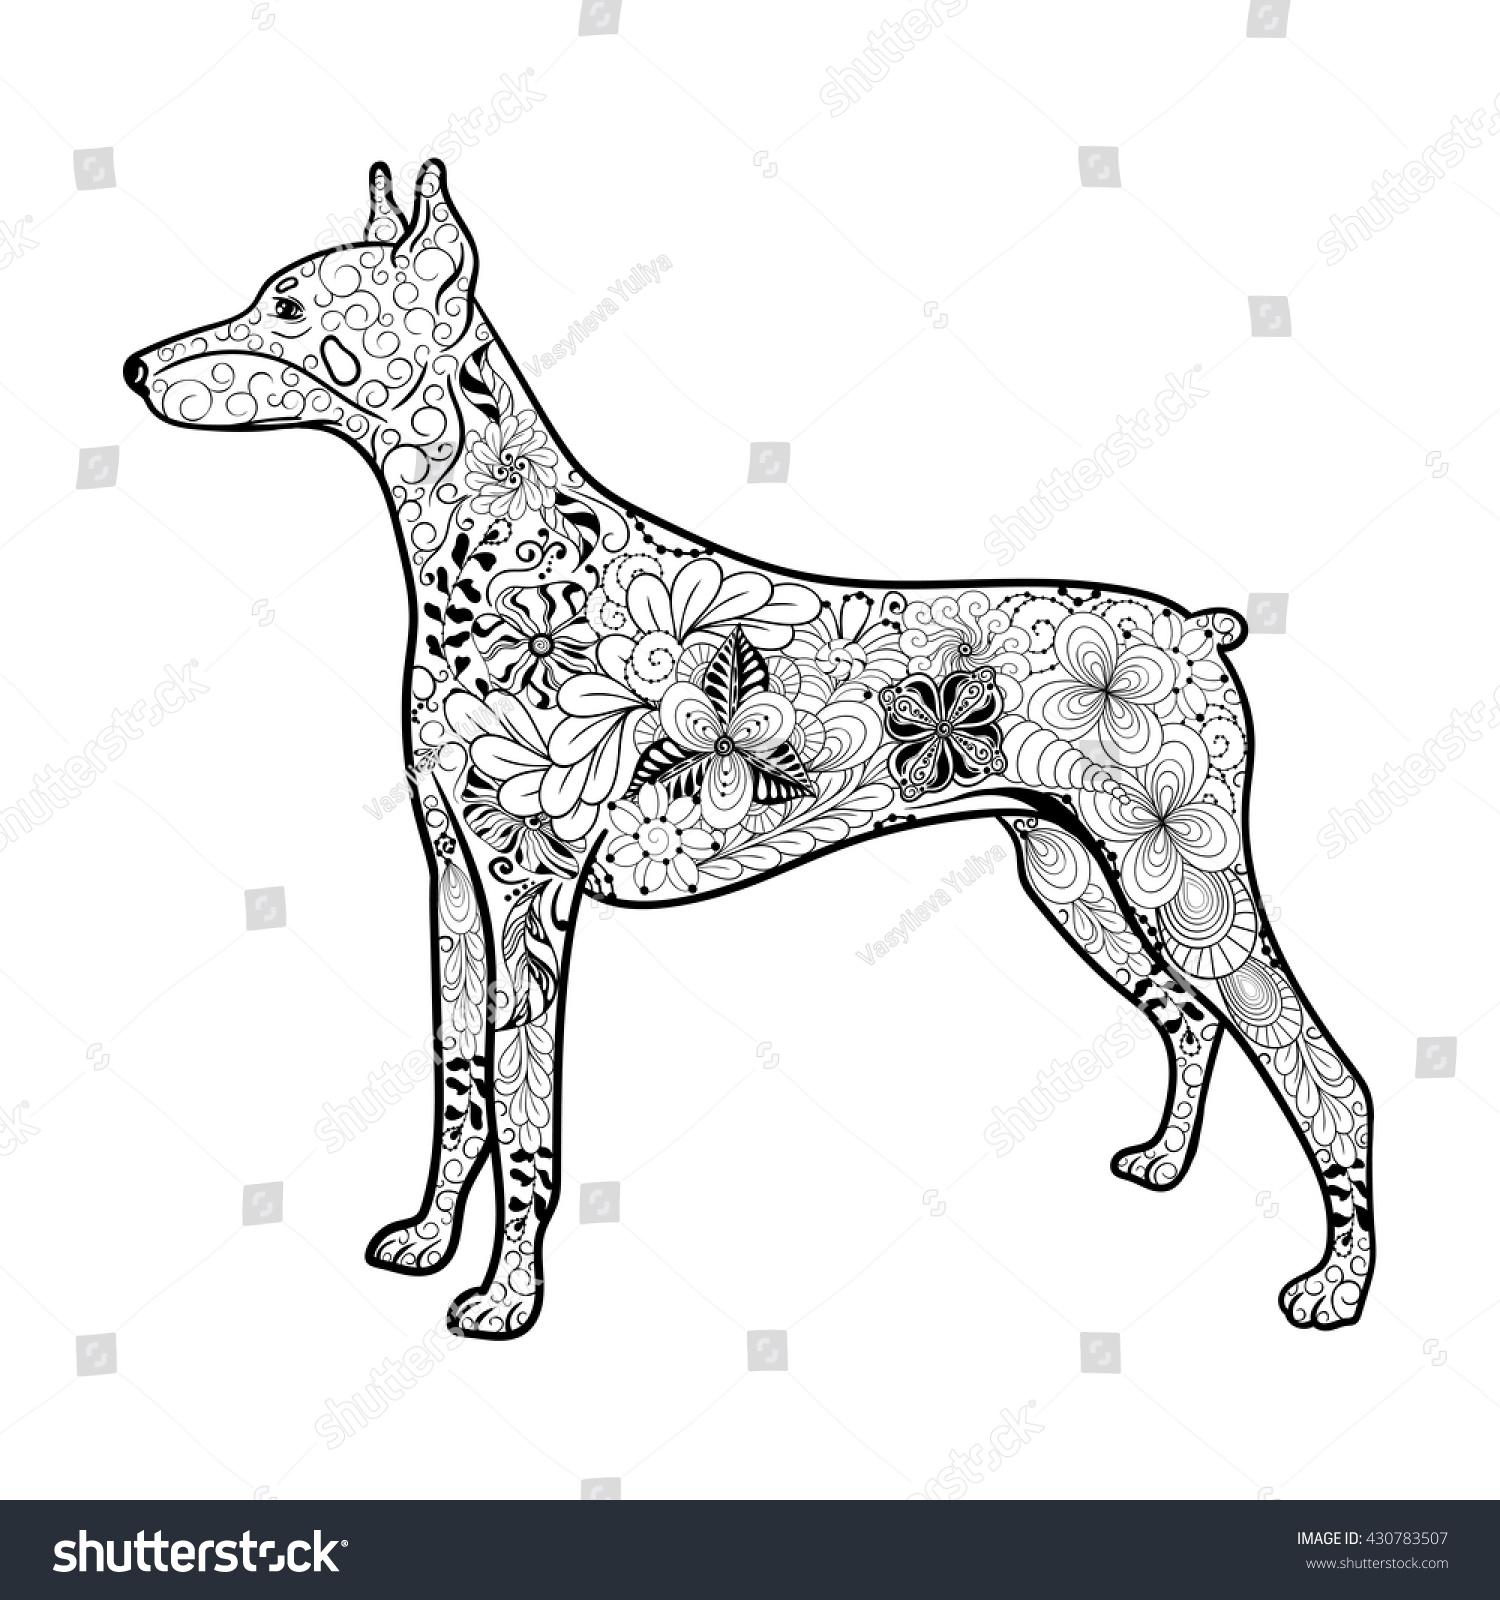 doberman coloring pages - illustration doberman dog created doodling style stock